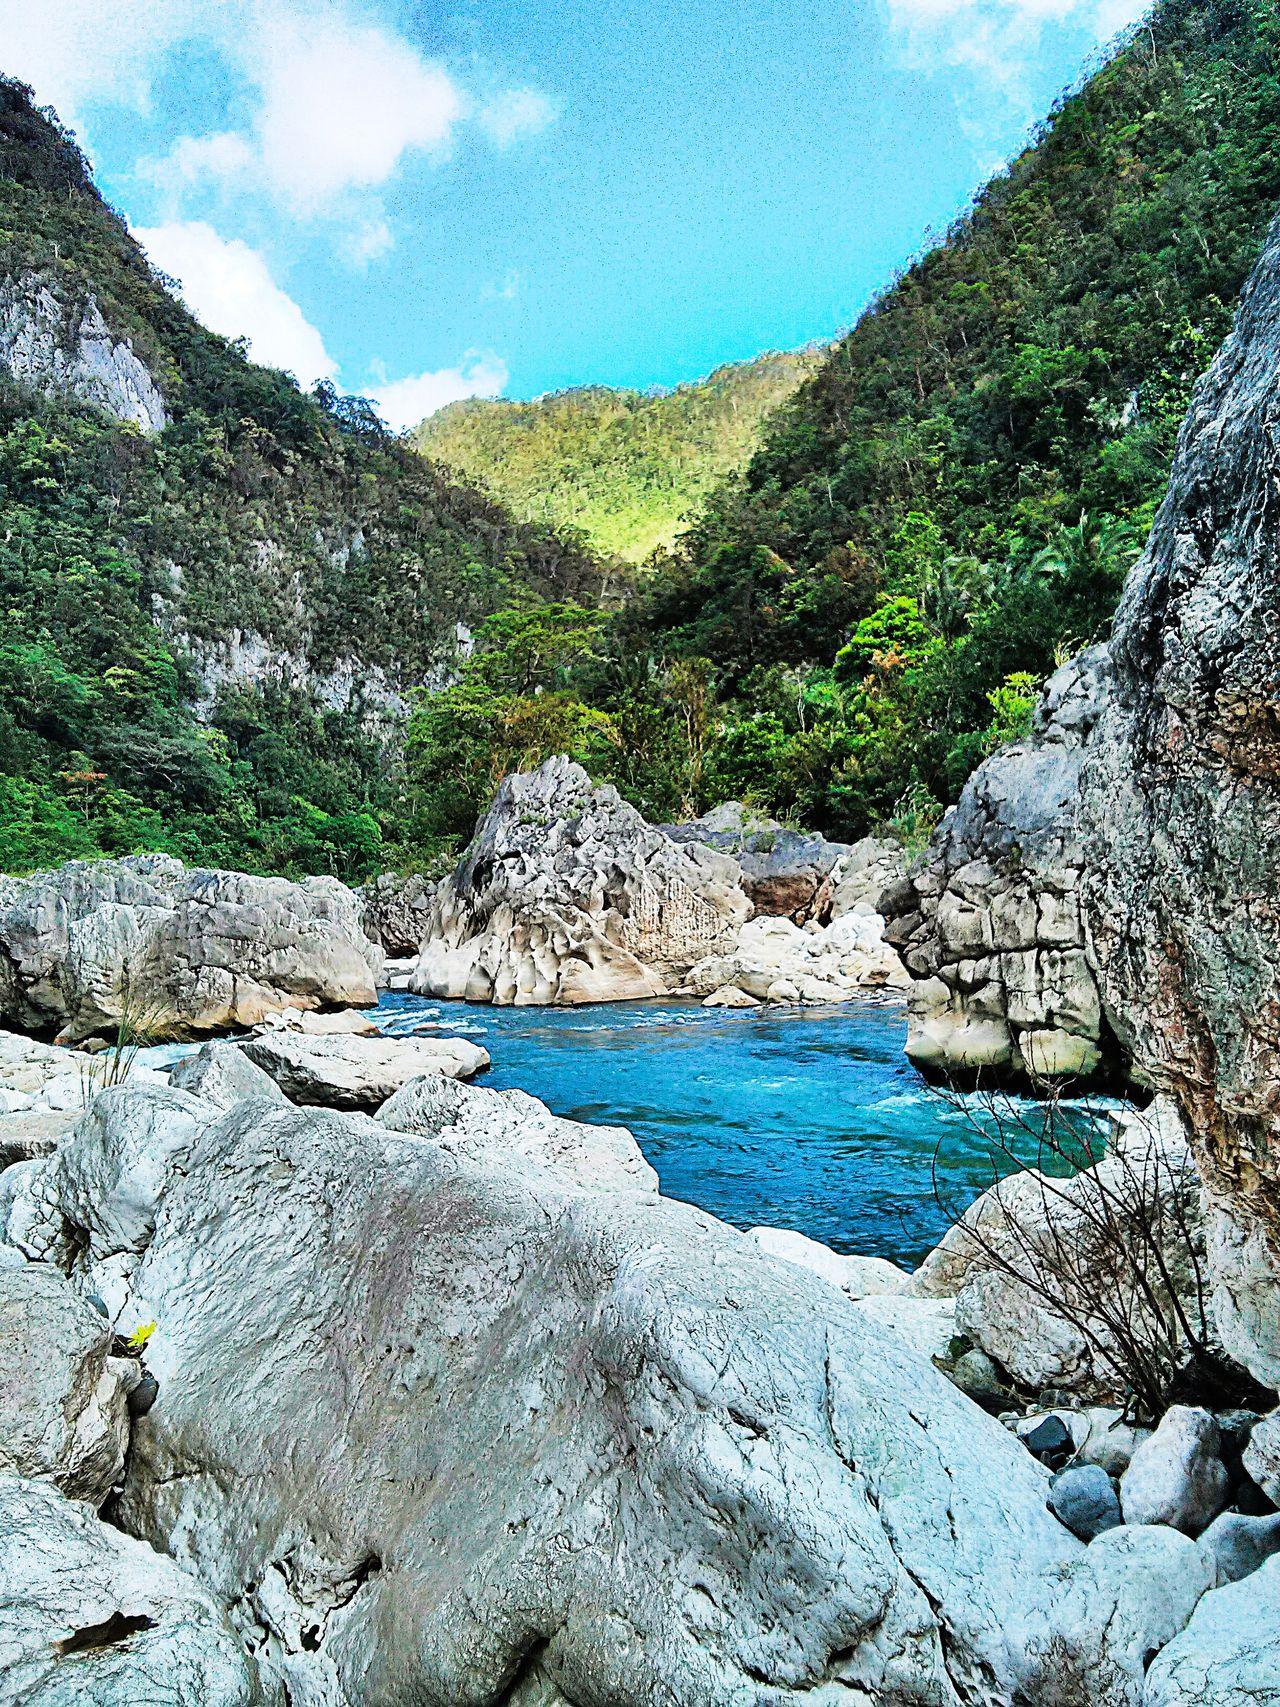 Summer river trek. Landscape Nature Scenics Mountain Beauty In Nature Outdoors Travel Destinations Travel Travel Photography Neighborhood Map The Great Outdoors - 2017 EyeEm Awards Rizal Philippines River Tinipak Daraitan Summer